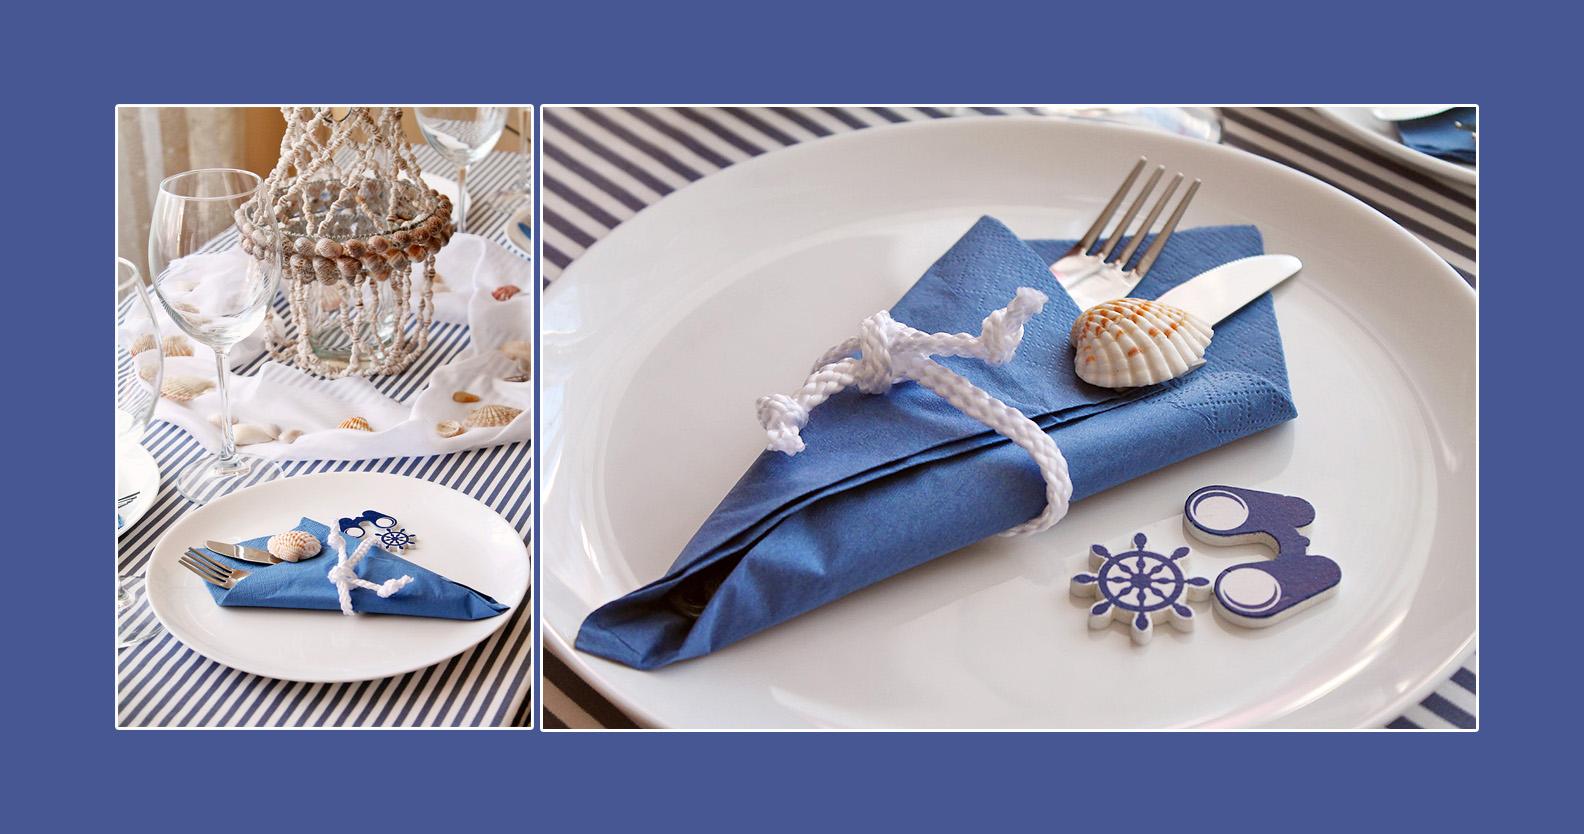 Maritime Deko Idee in Blau-Weiß